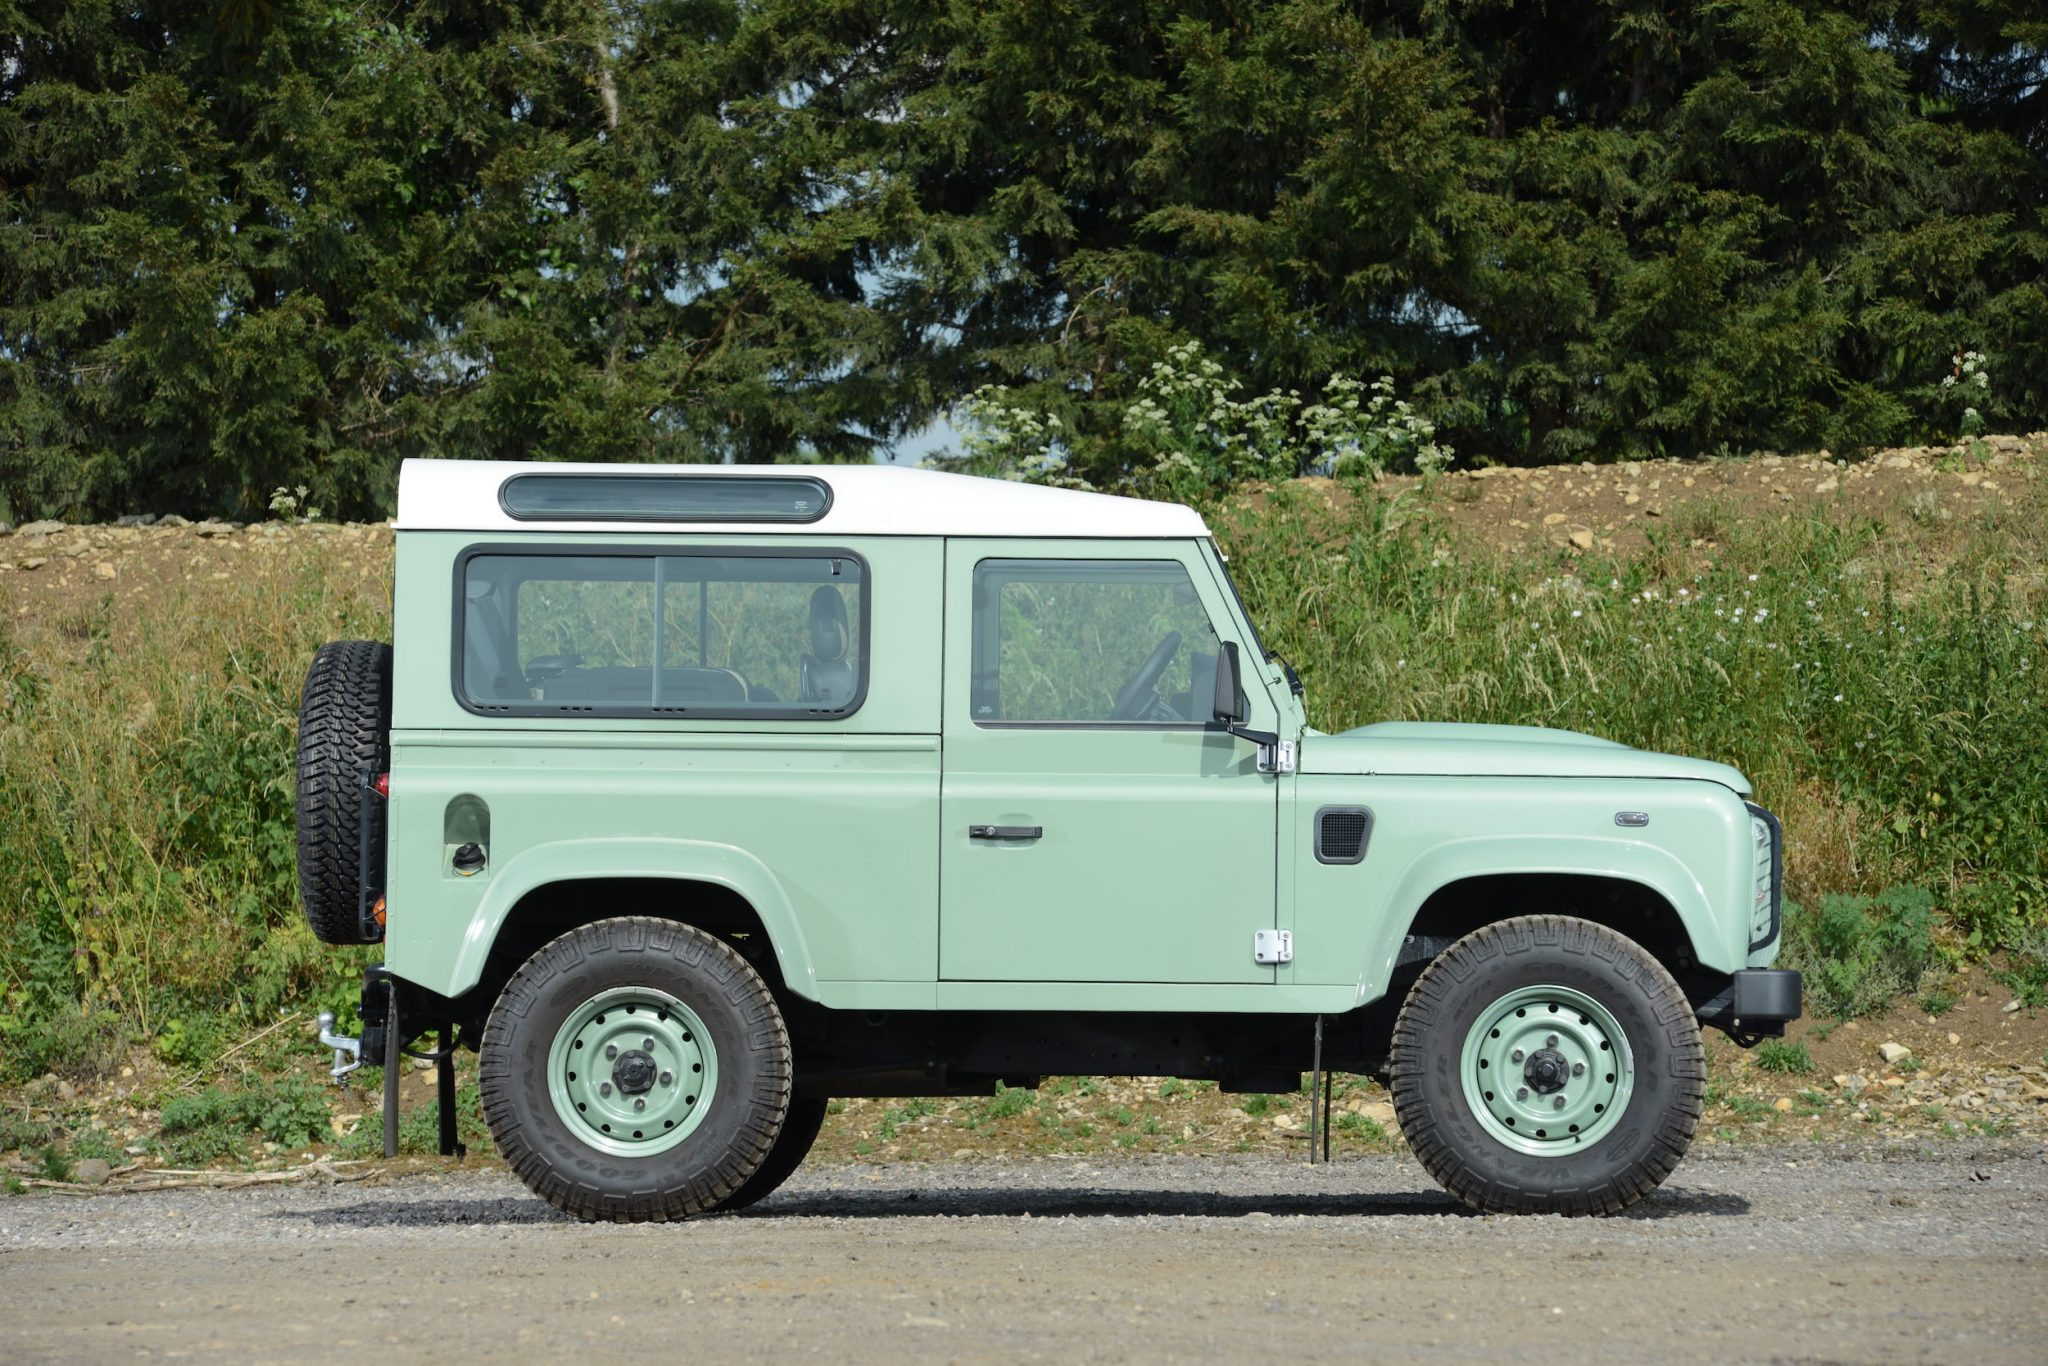 Range Rover Interior >> Rowan Atkinson's Land Rover Defender